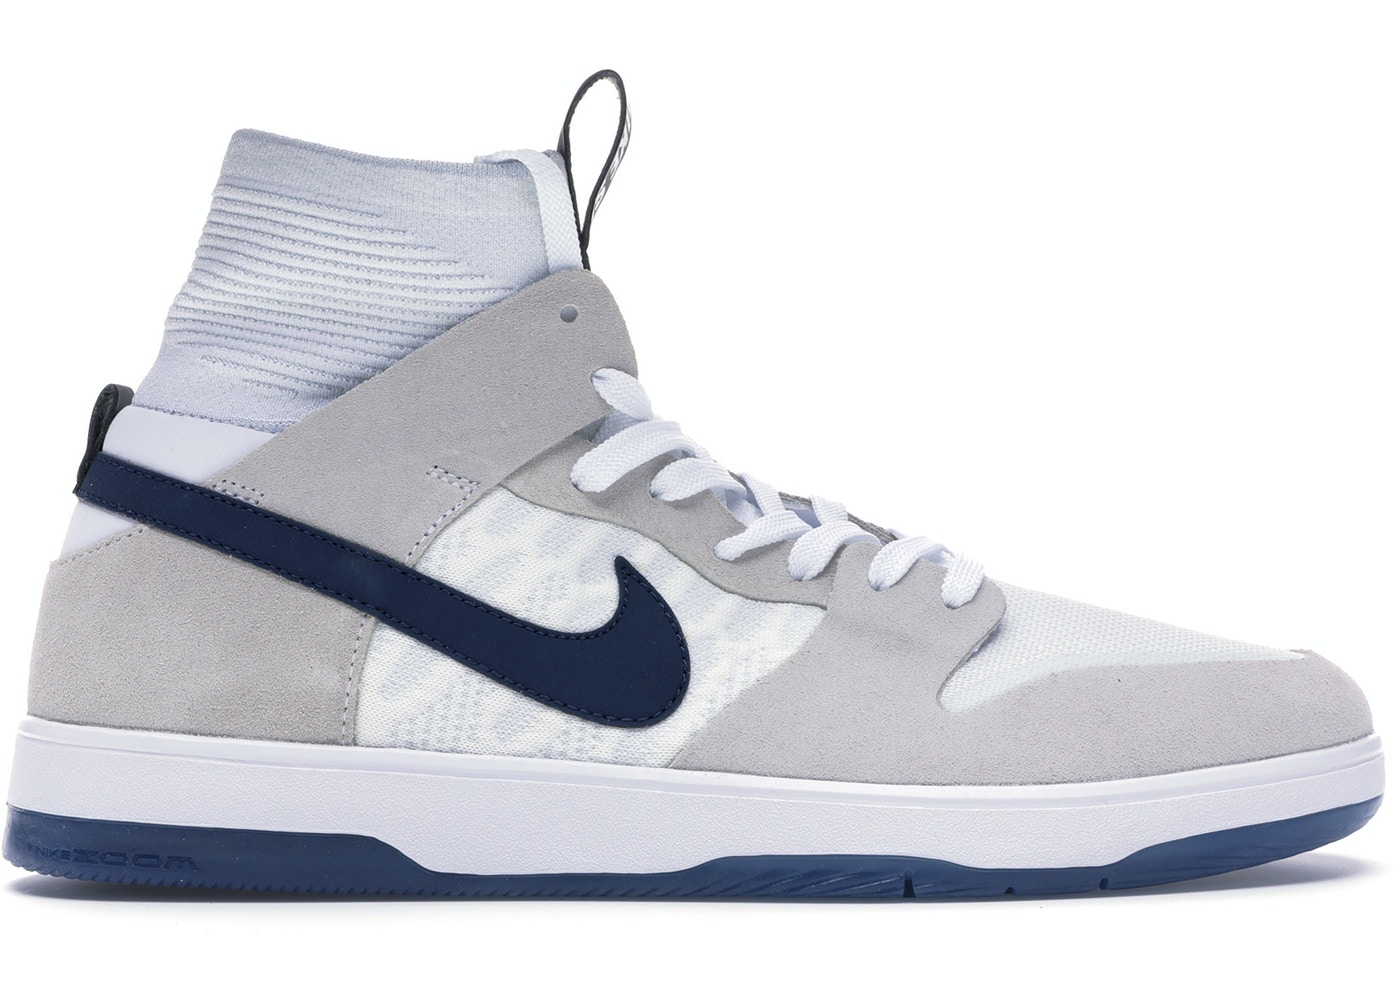 new style 5a1b9 853c1 Nike SB Dunk High Elite Cyrus Bennett